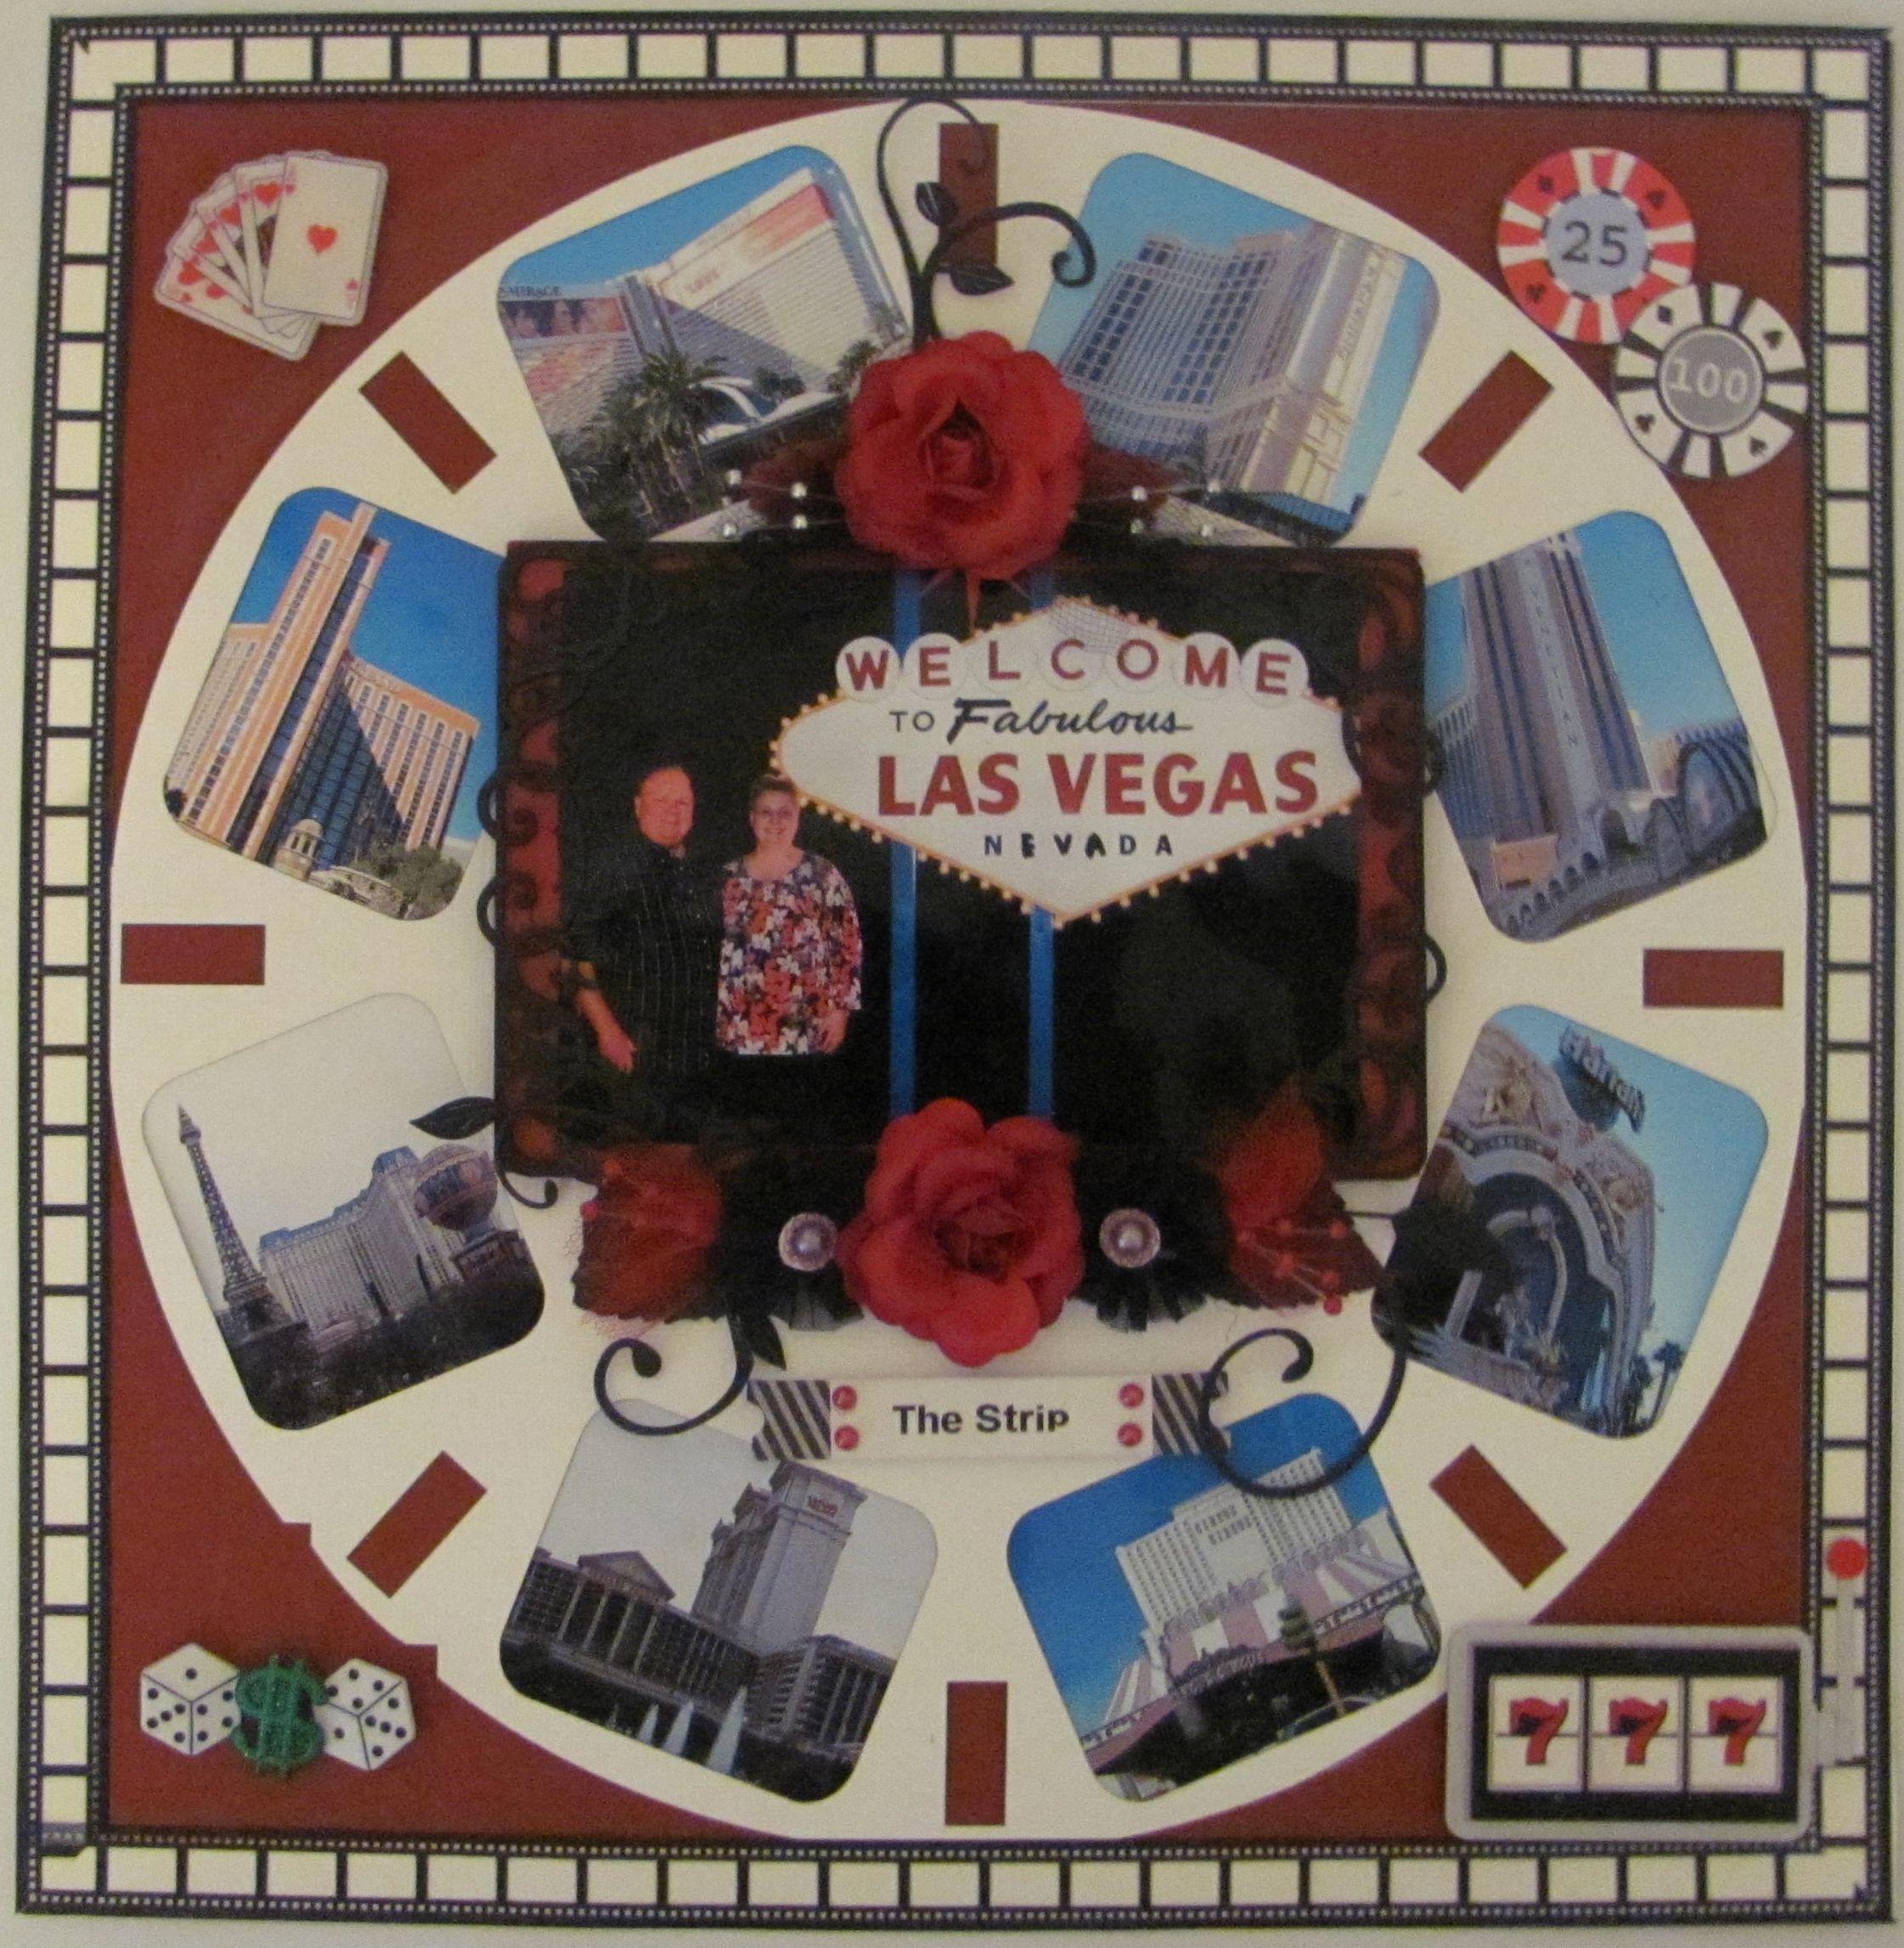 Scrapbook ideas las vegas - Las Vegas The Strip Scrapbook Com Scrapbooking Layouts Vegasscrapbooking